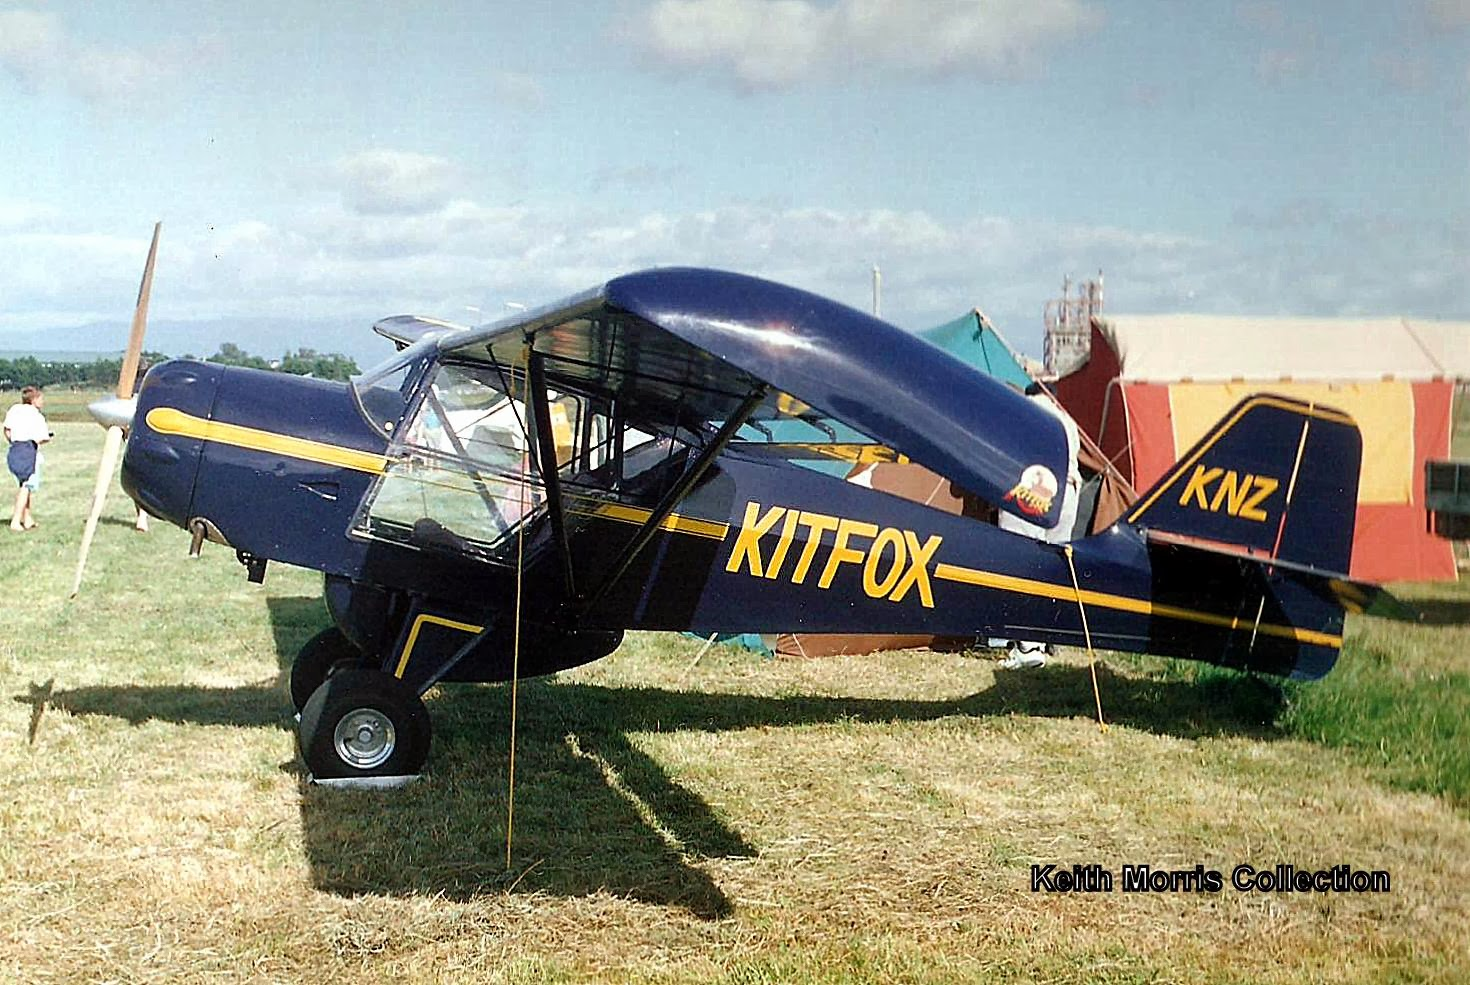 Kit fox aircraft